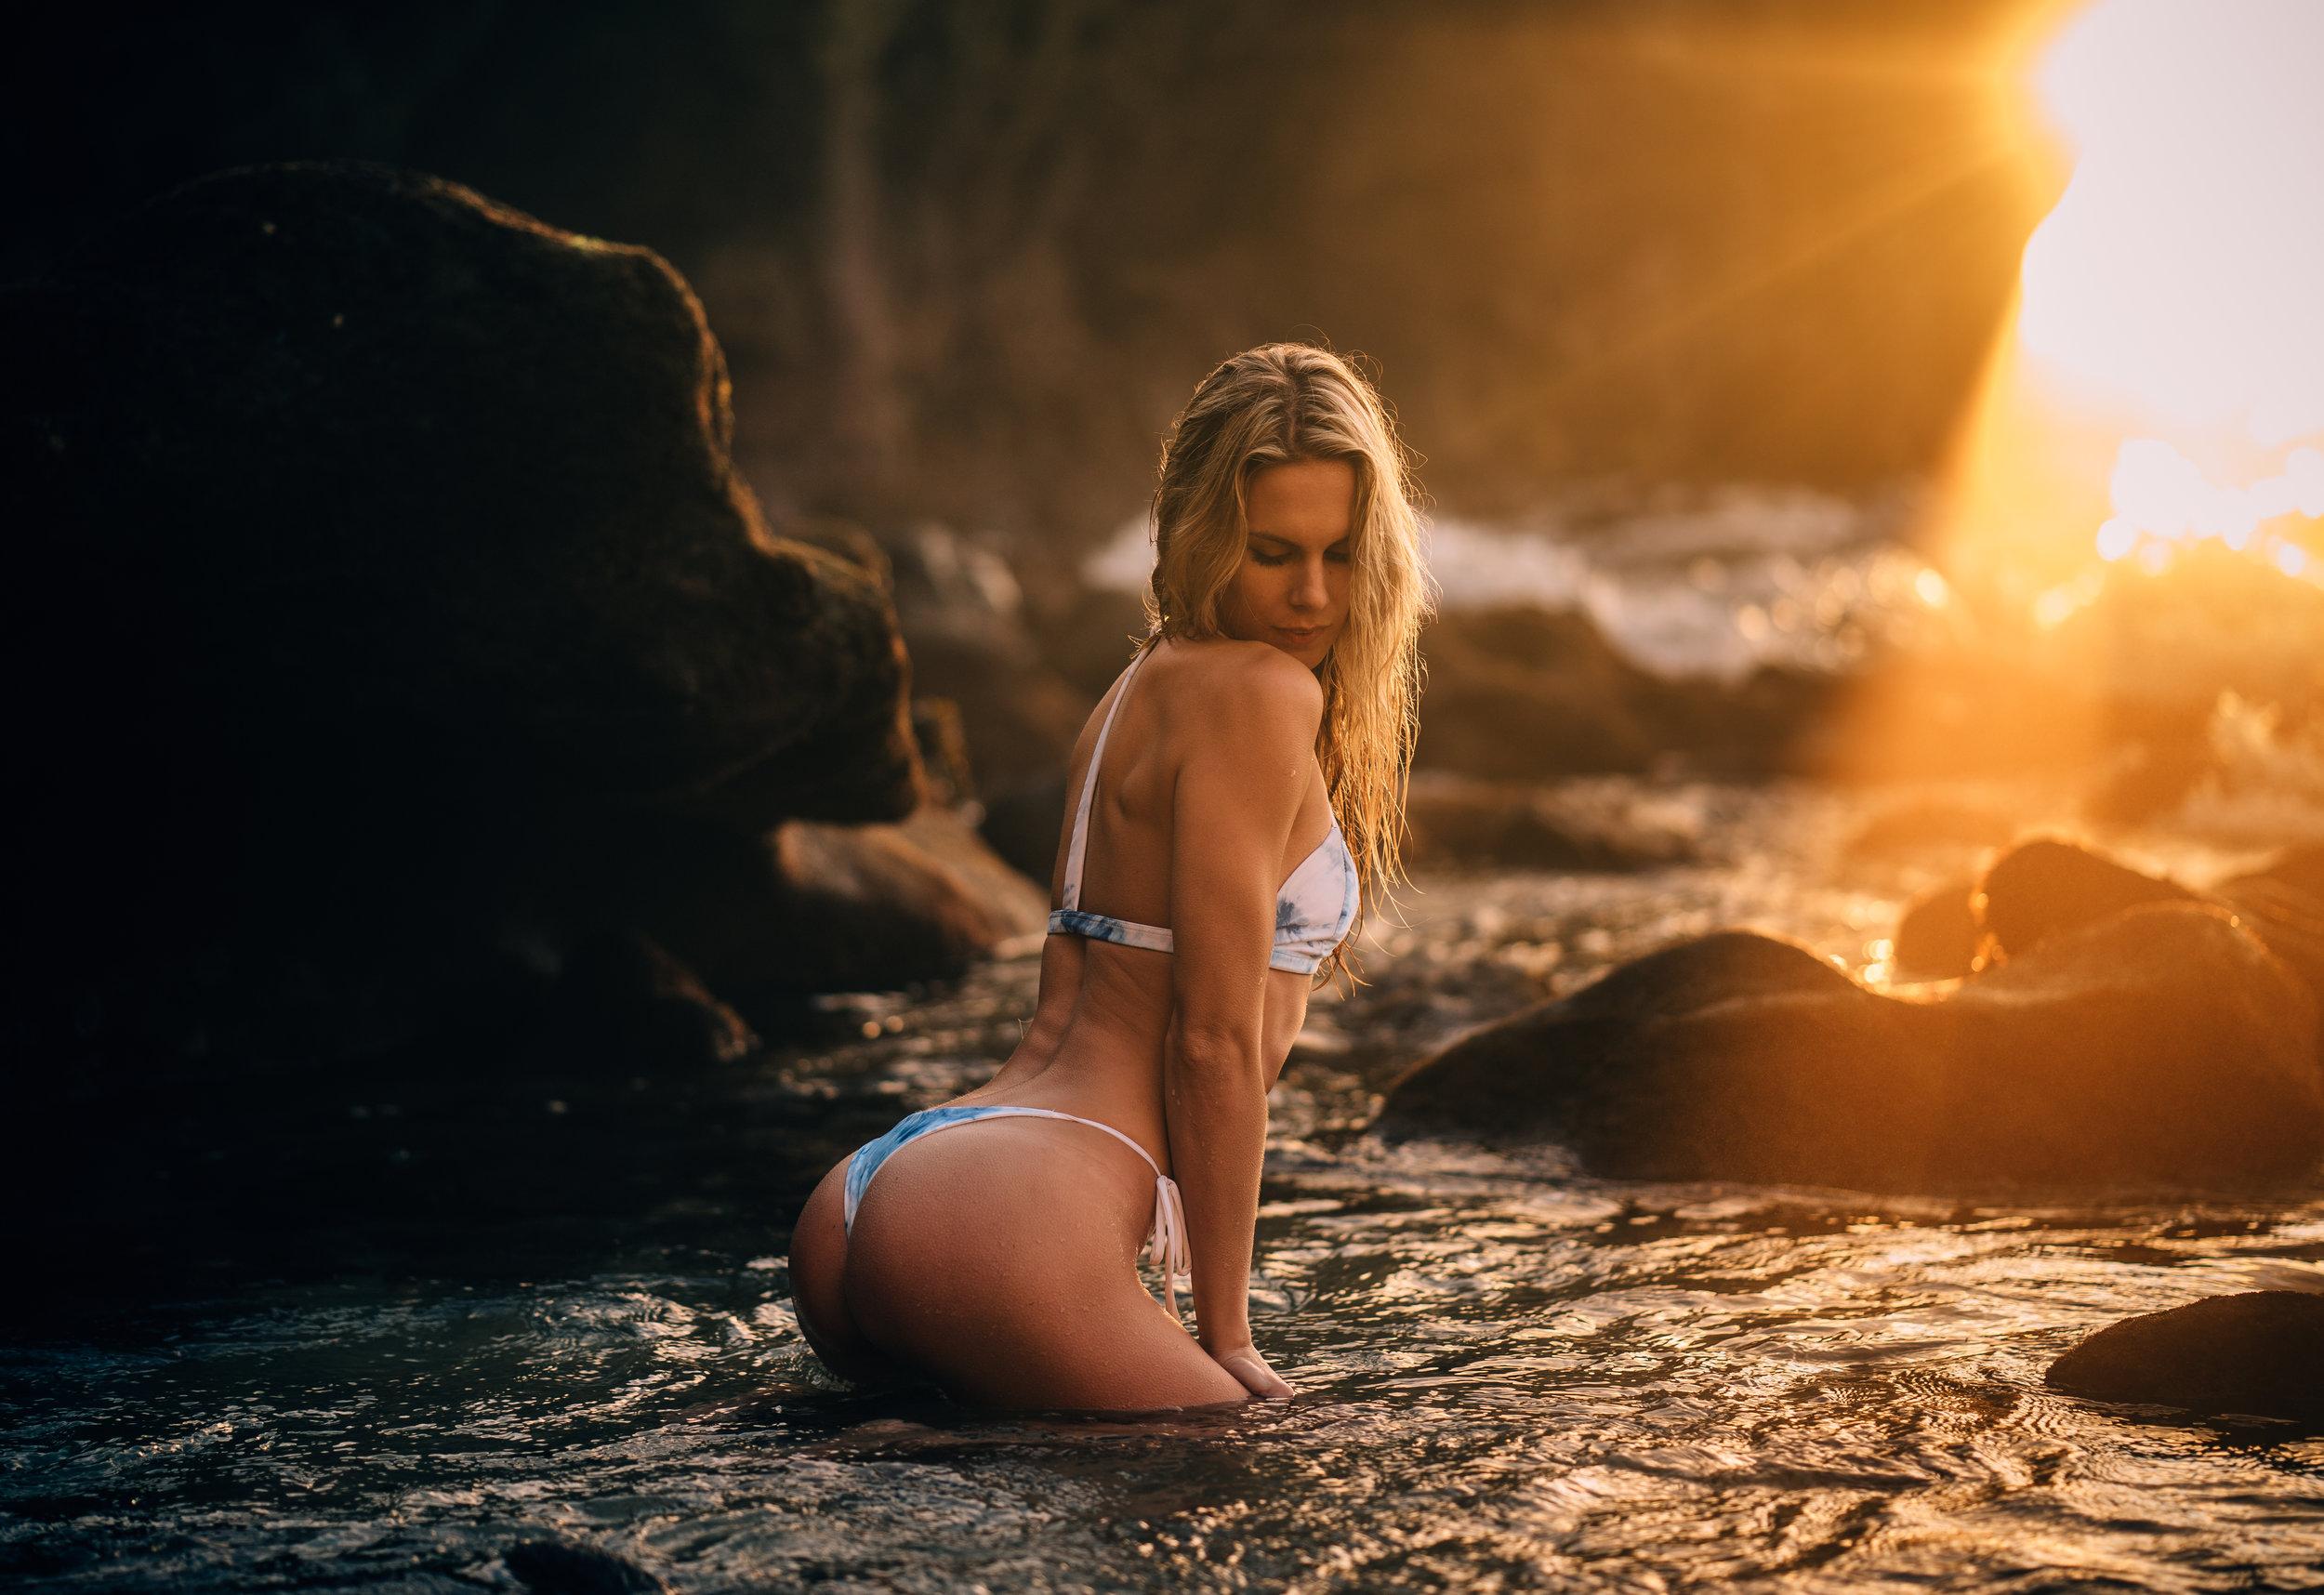 @danimdunn & danii_Alyssa | @RIVIBIKINIS  Pearl Street Beach - Laguna Beach, California